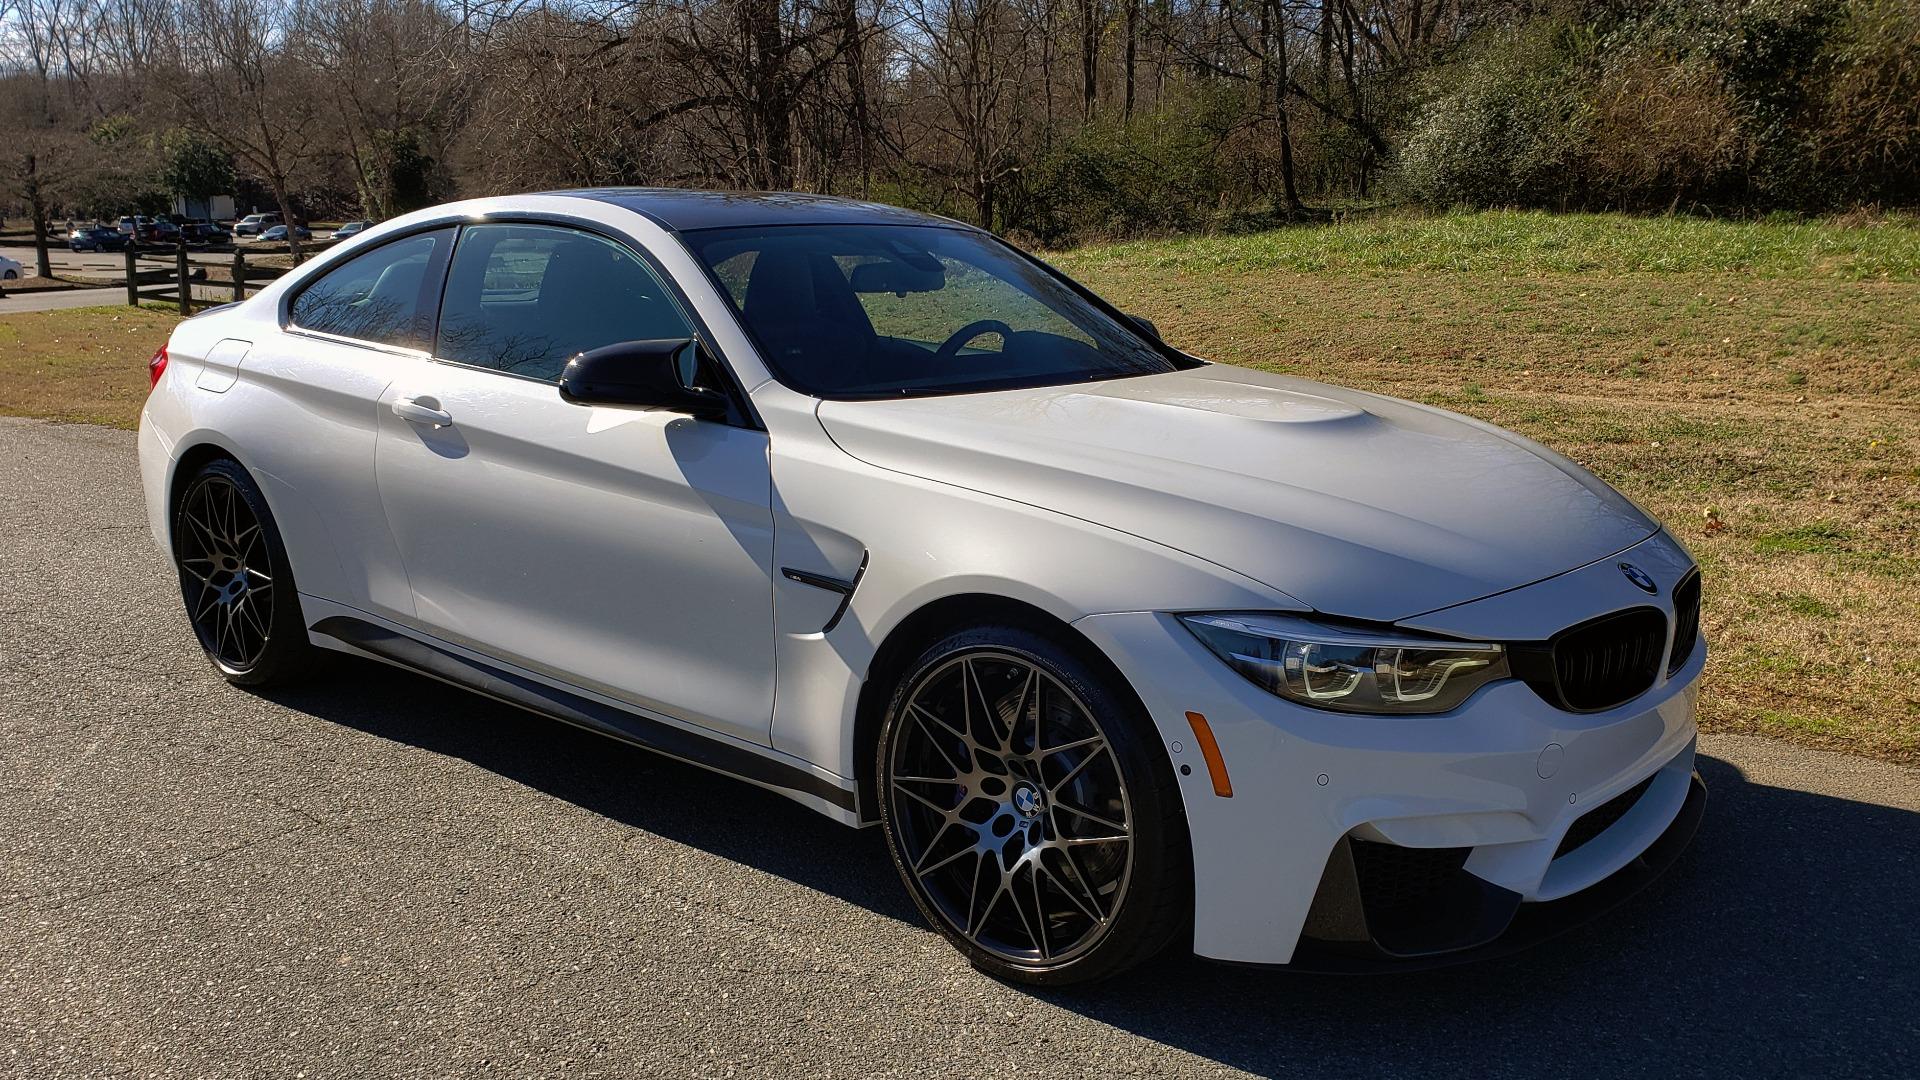 Used 2018 BMW M4 COMP PKG / EXEC / M-DRIVER / PARK CNTRL / ACTIVE BLIND SPOT for sale Sold at Formula Imports in Charlotte NC 28227 5